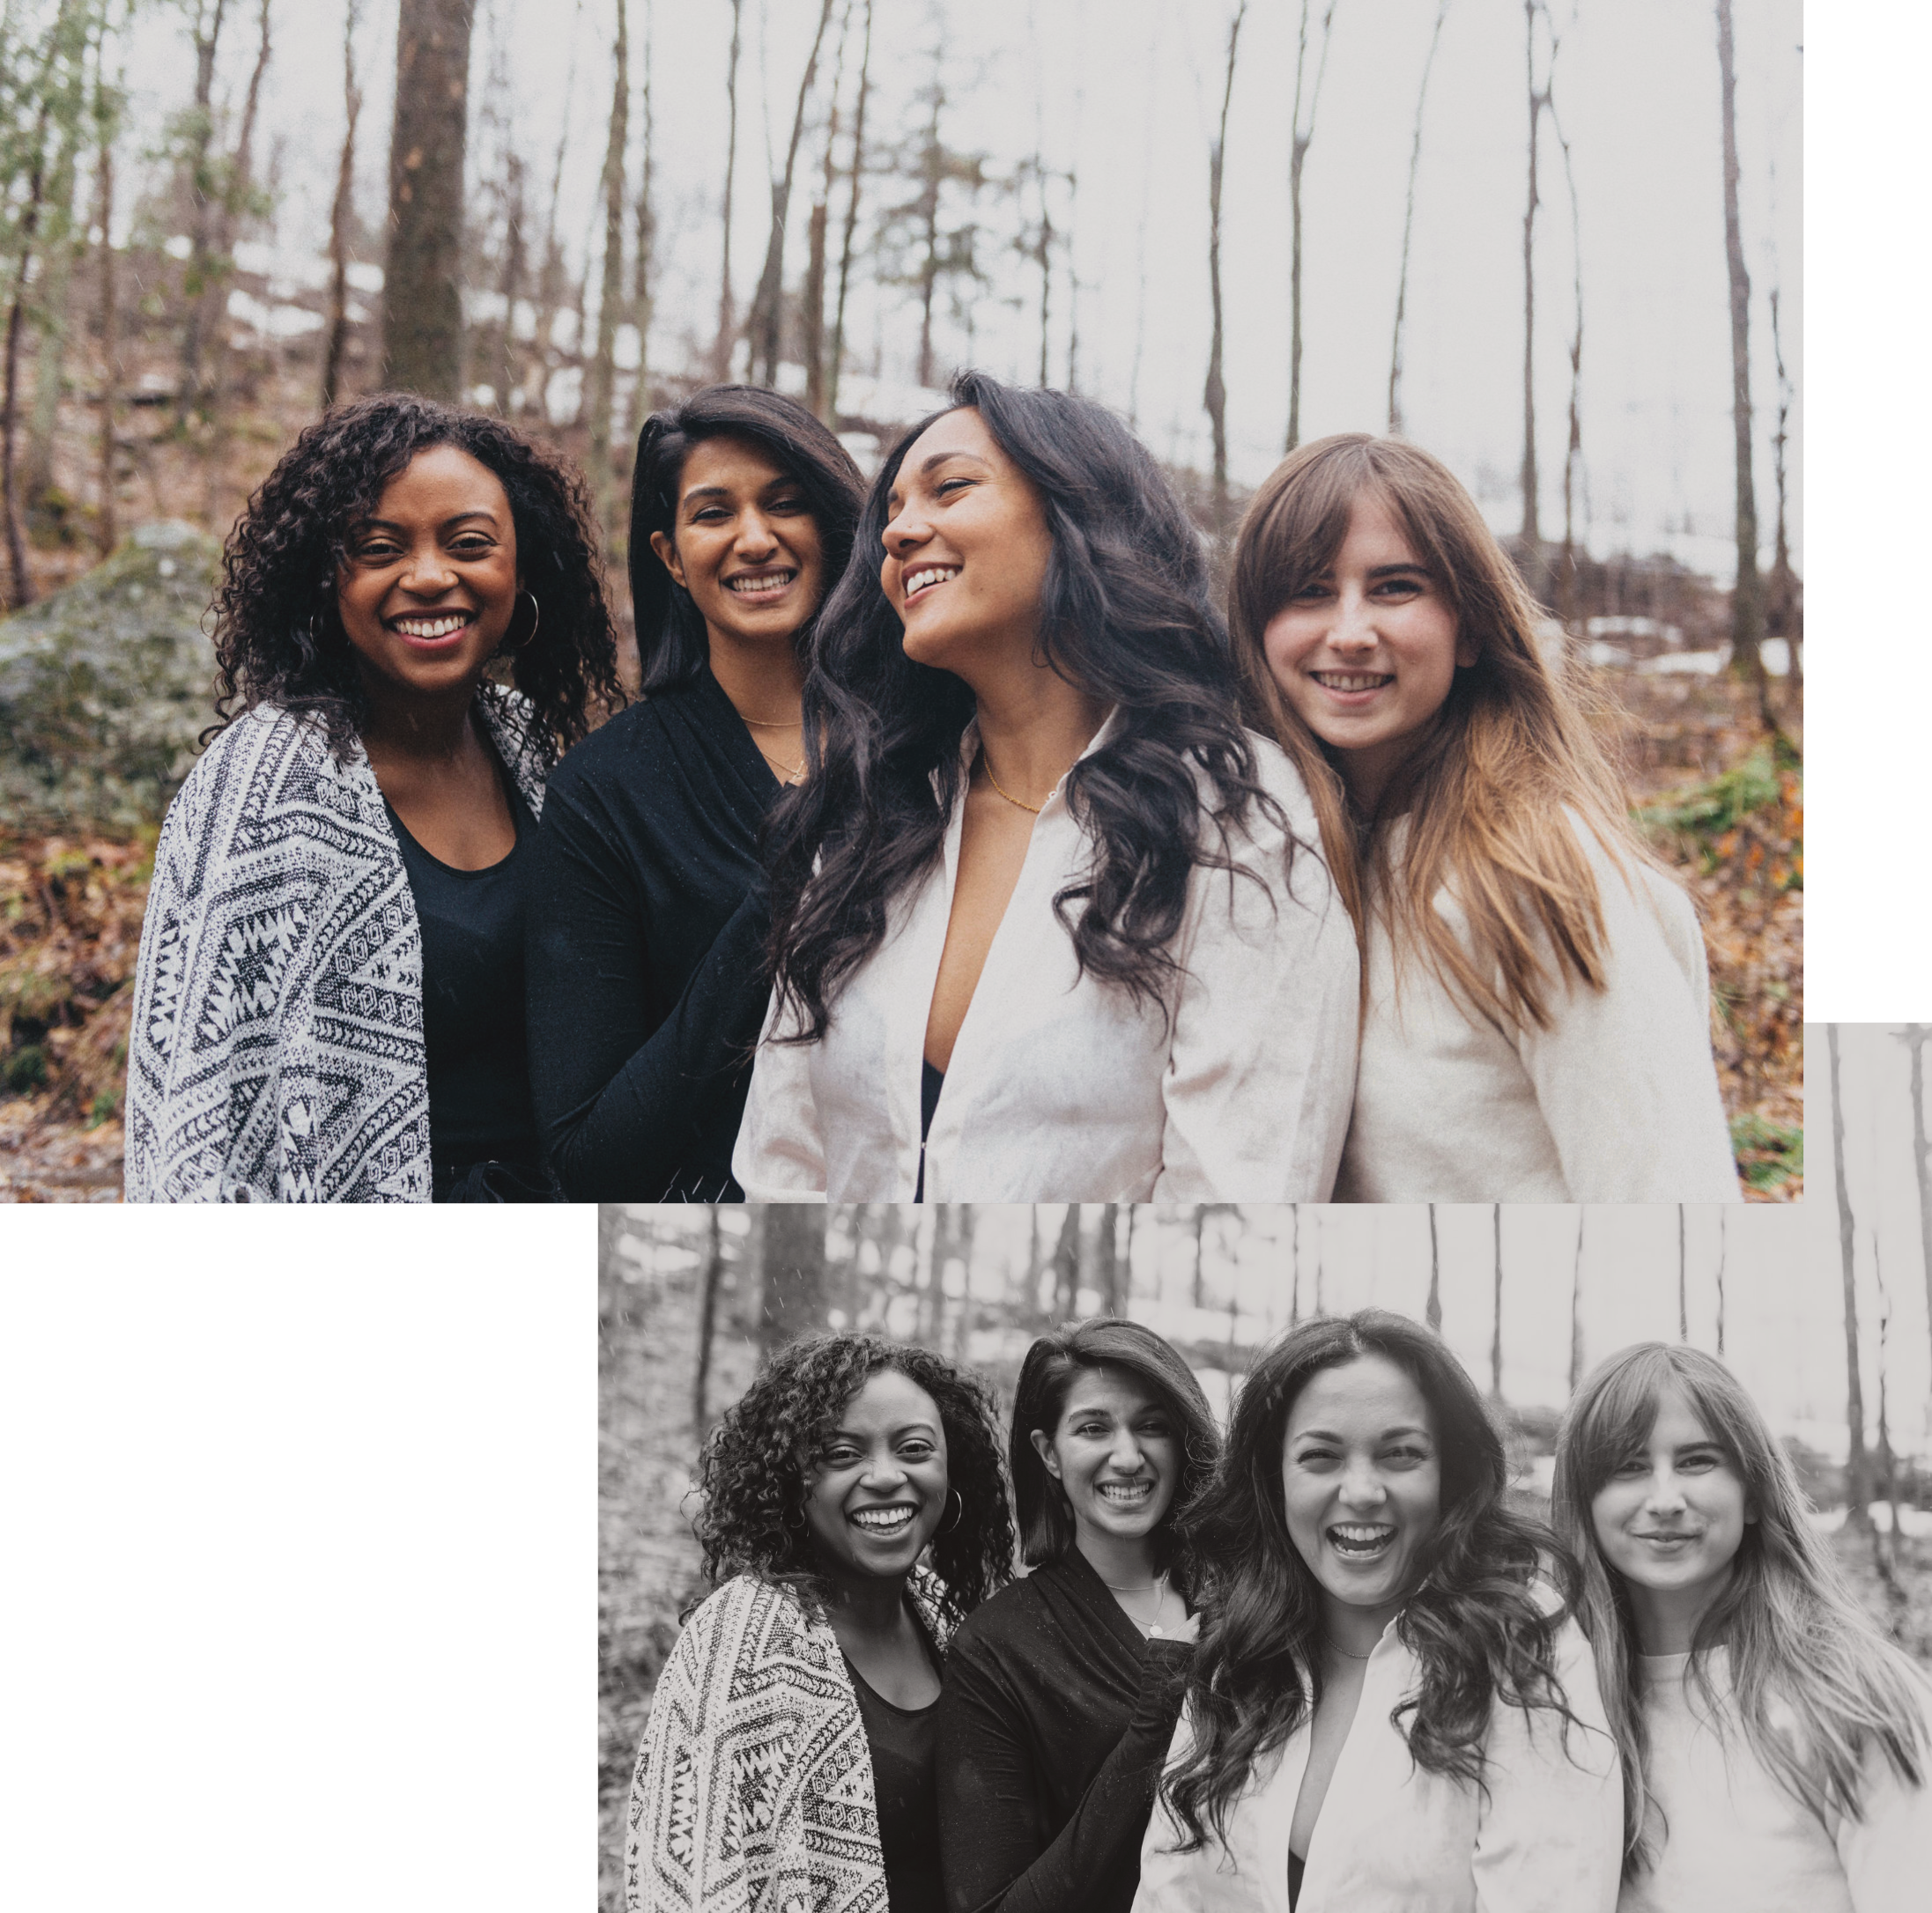 Kaur. Space Team  —  Jasmine, Renira, Komal, Kylie (from left to right) •